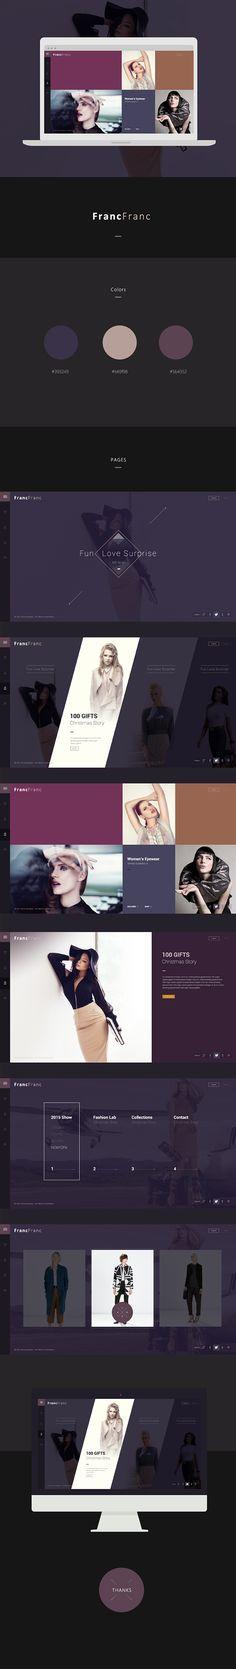 website concept design on Behance